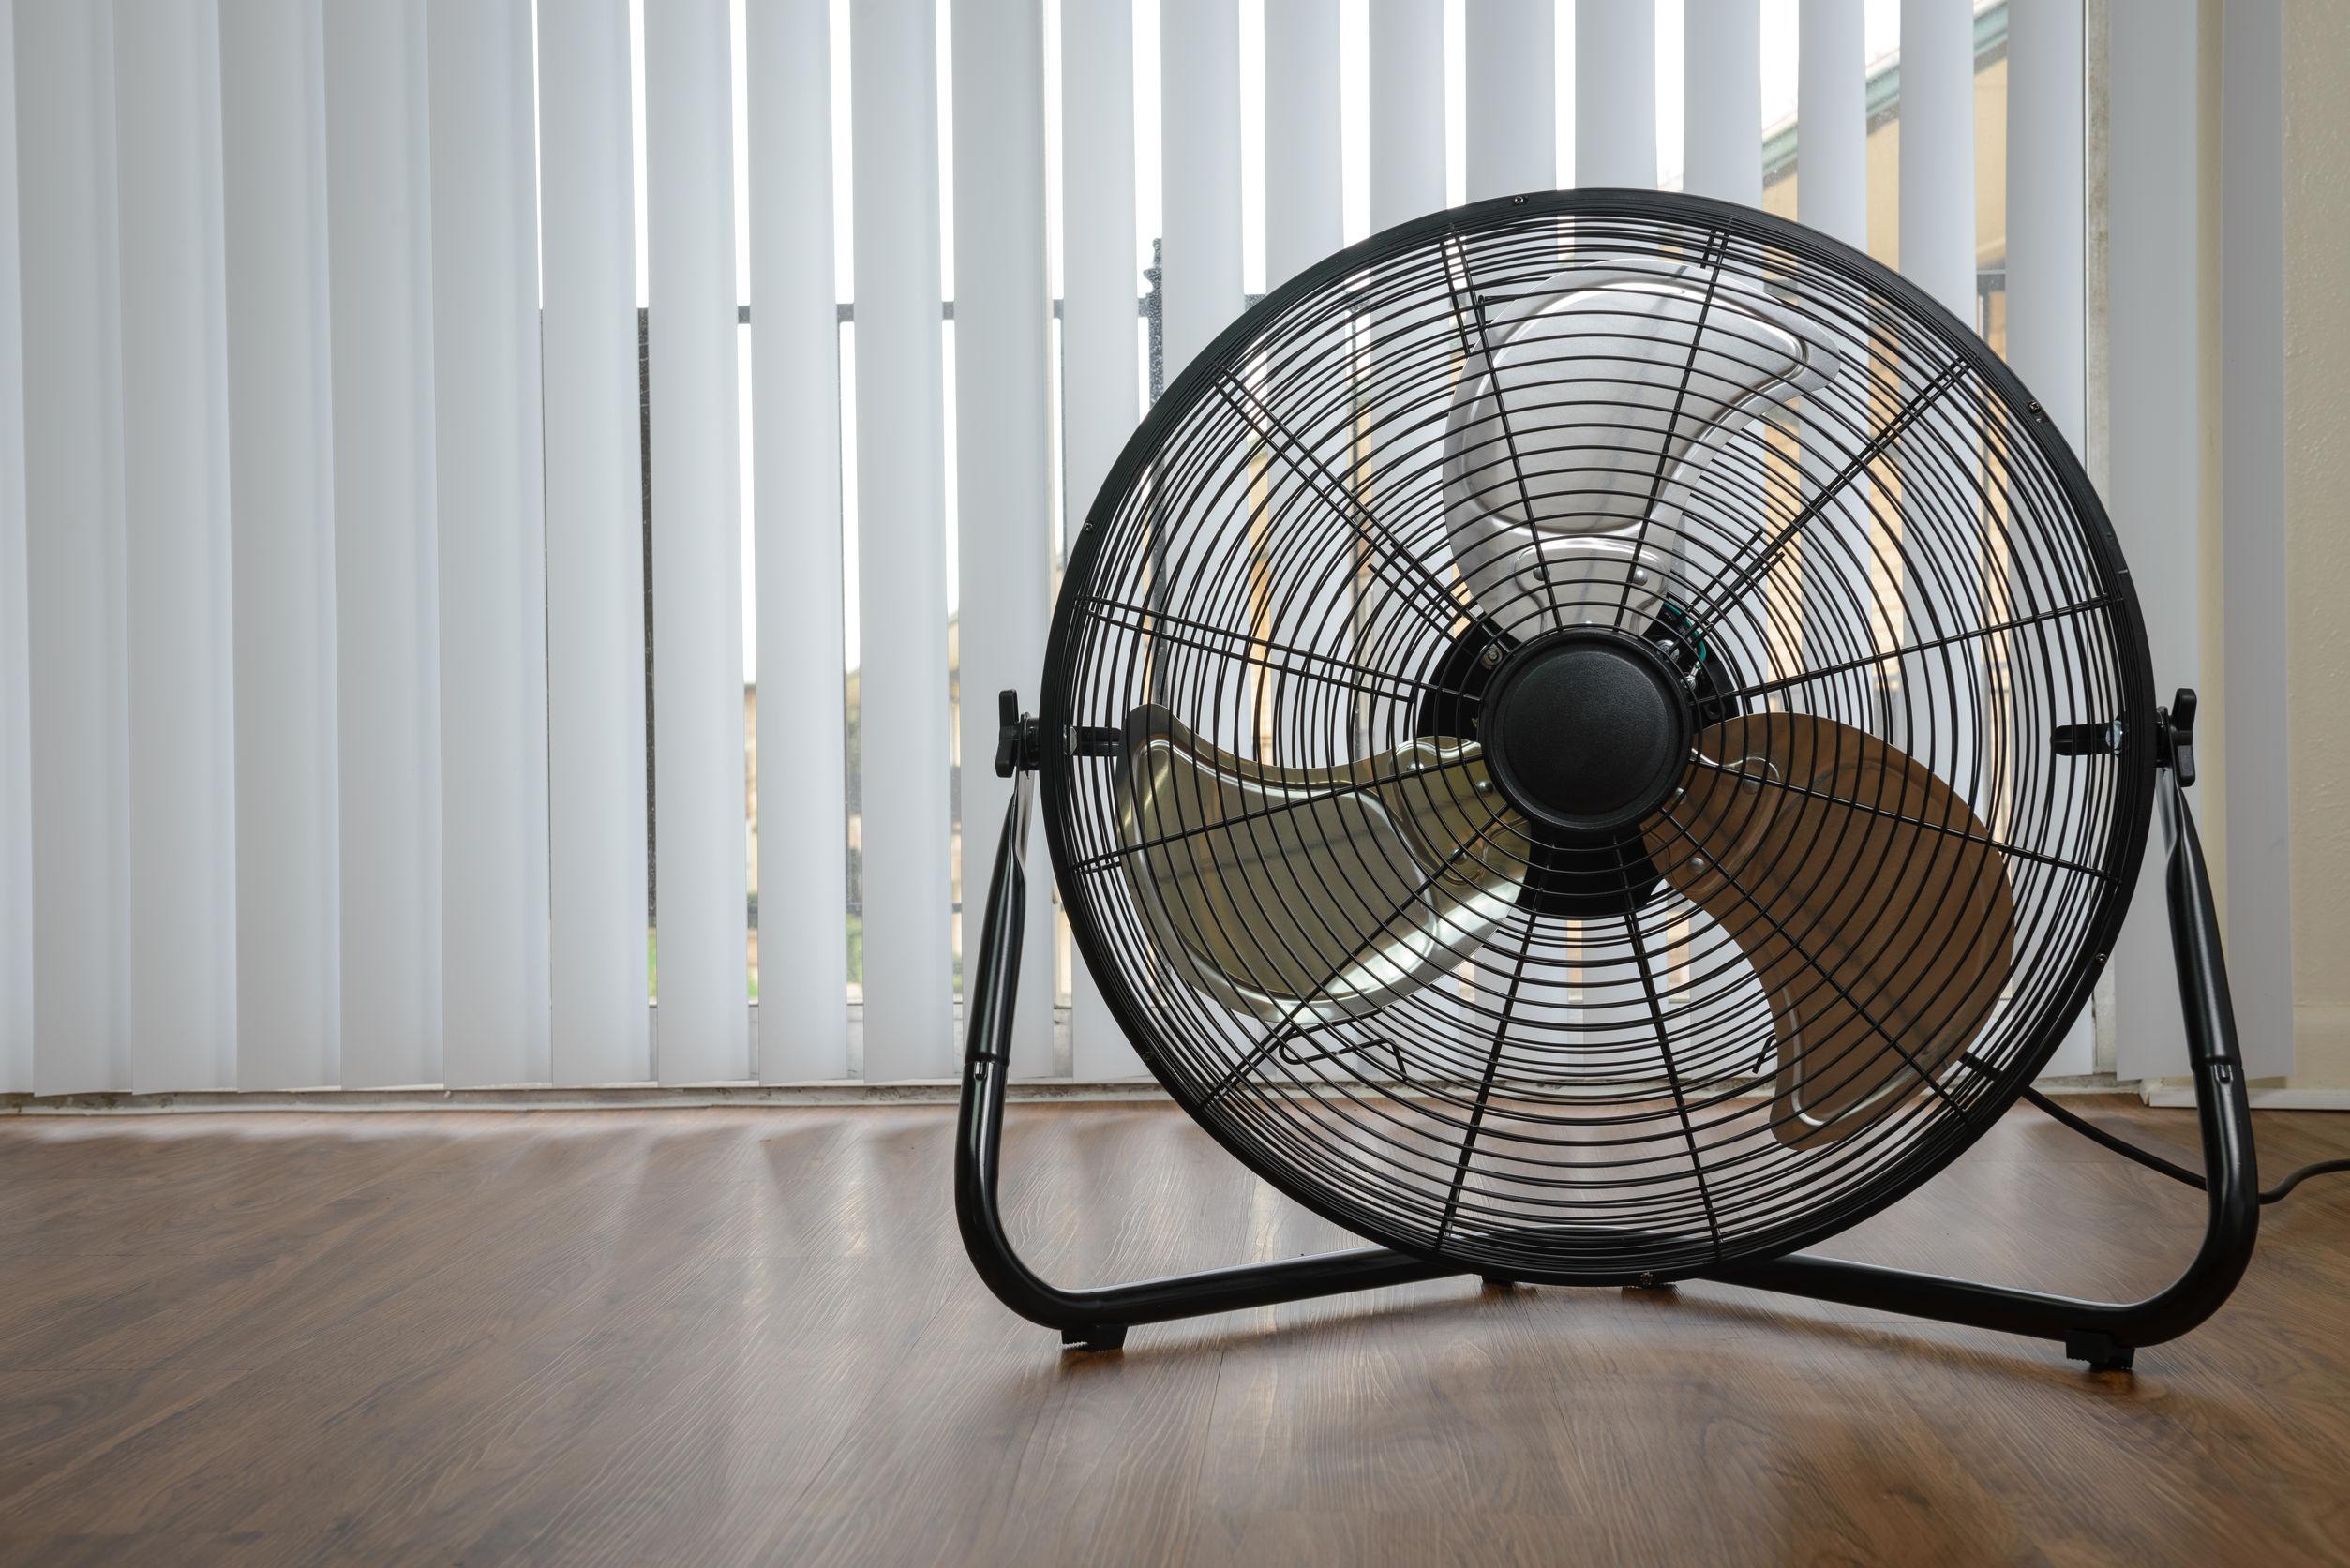 53210778 Black Metal Ventilation Fan On Wooden Floor